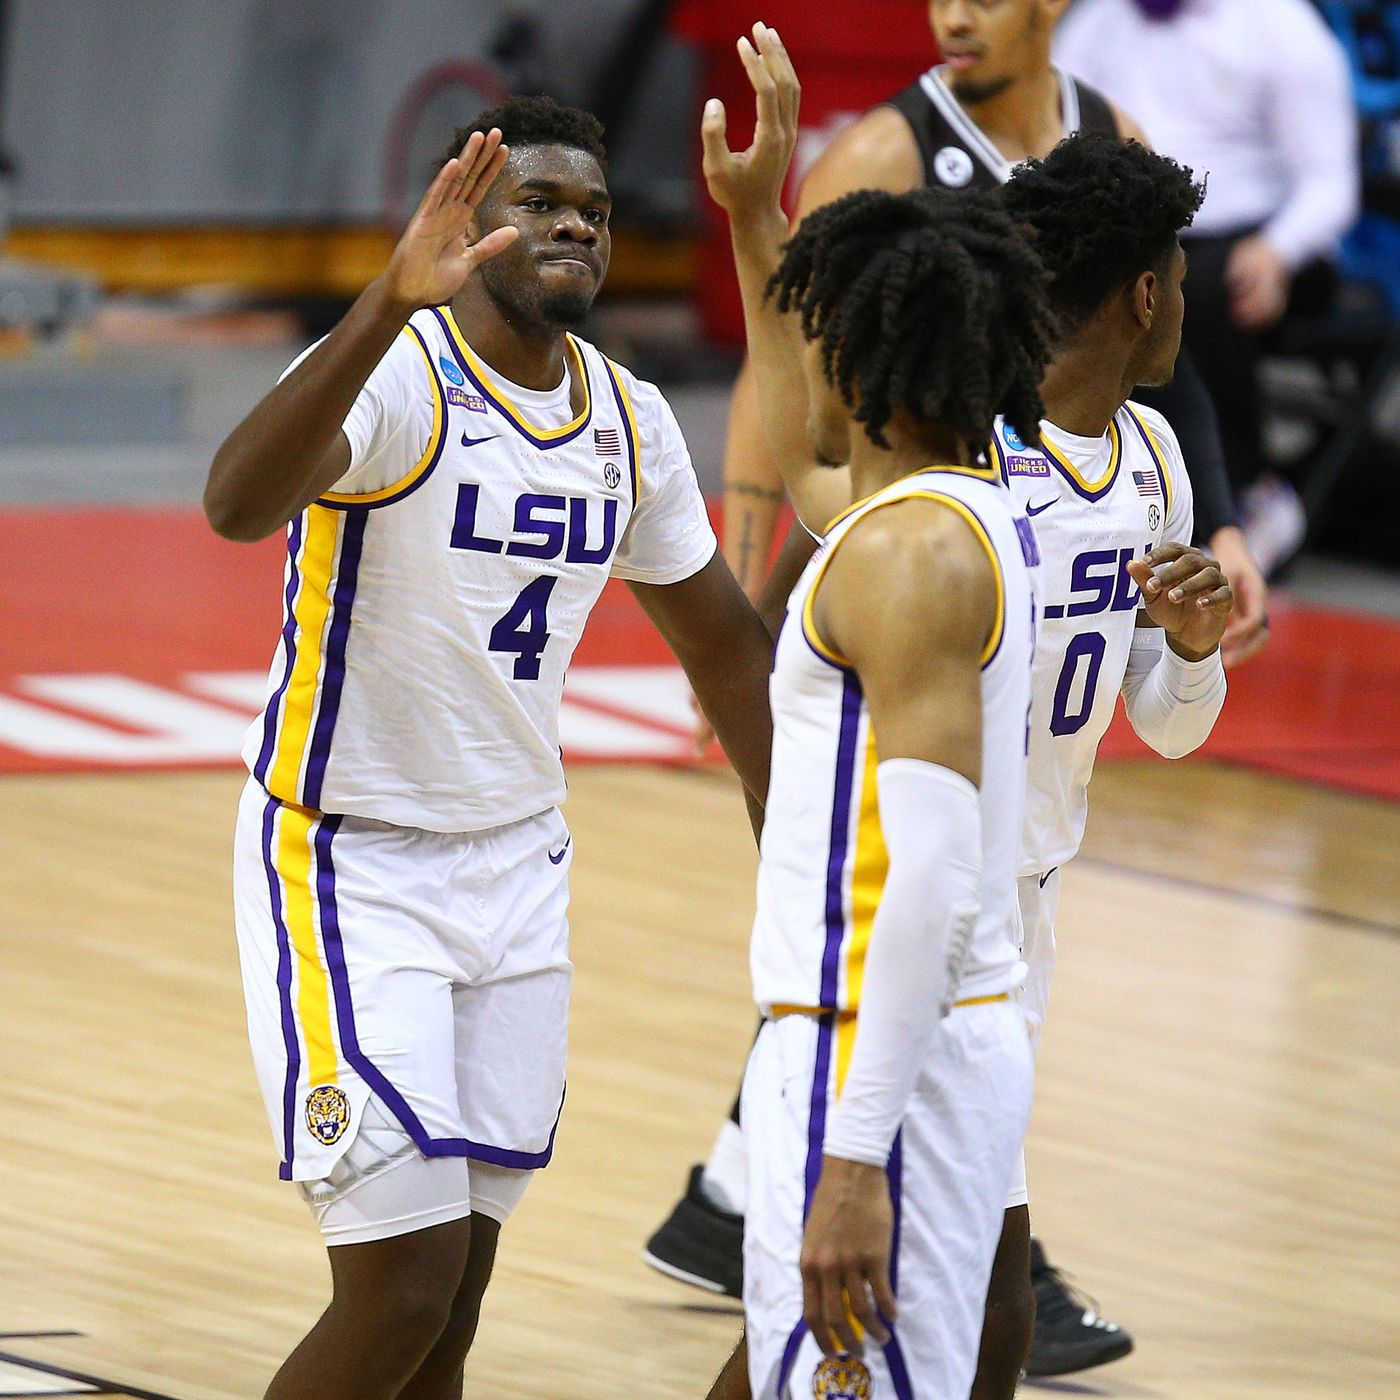 Aundre Hyatt LSU Tigers Basketball Jersey - Gold